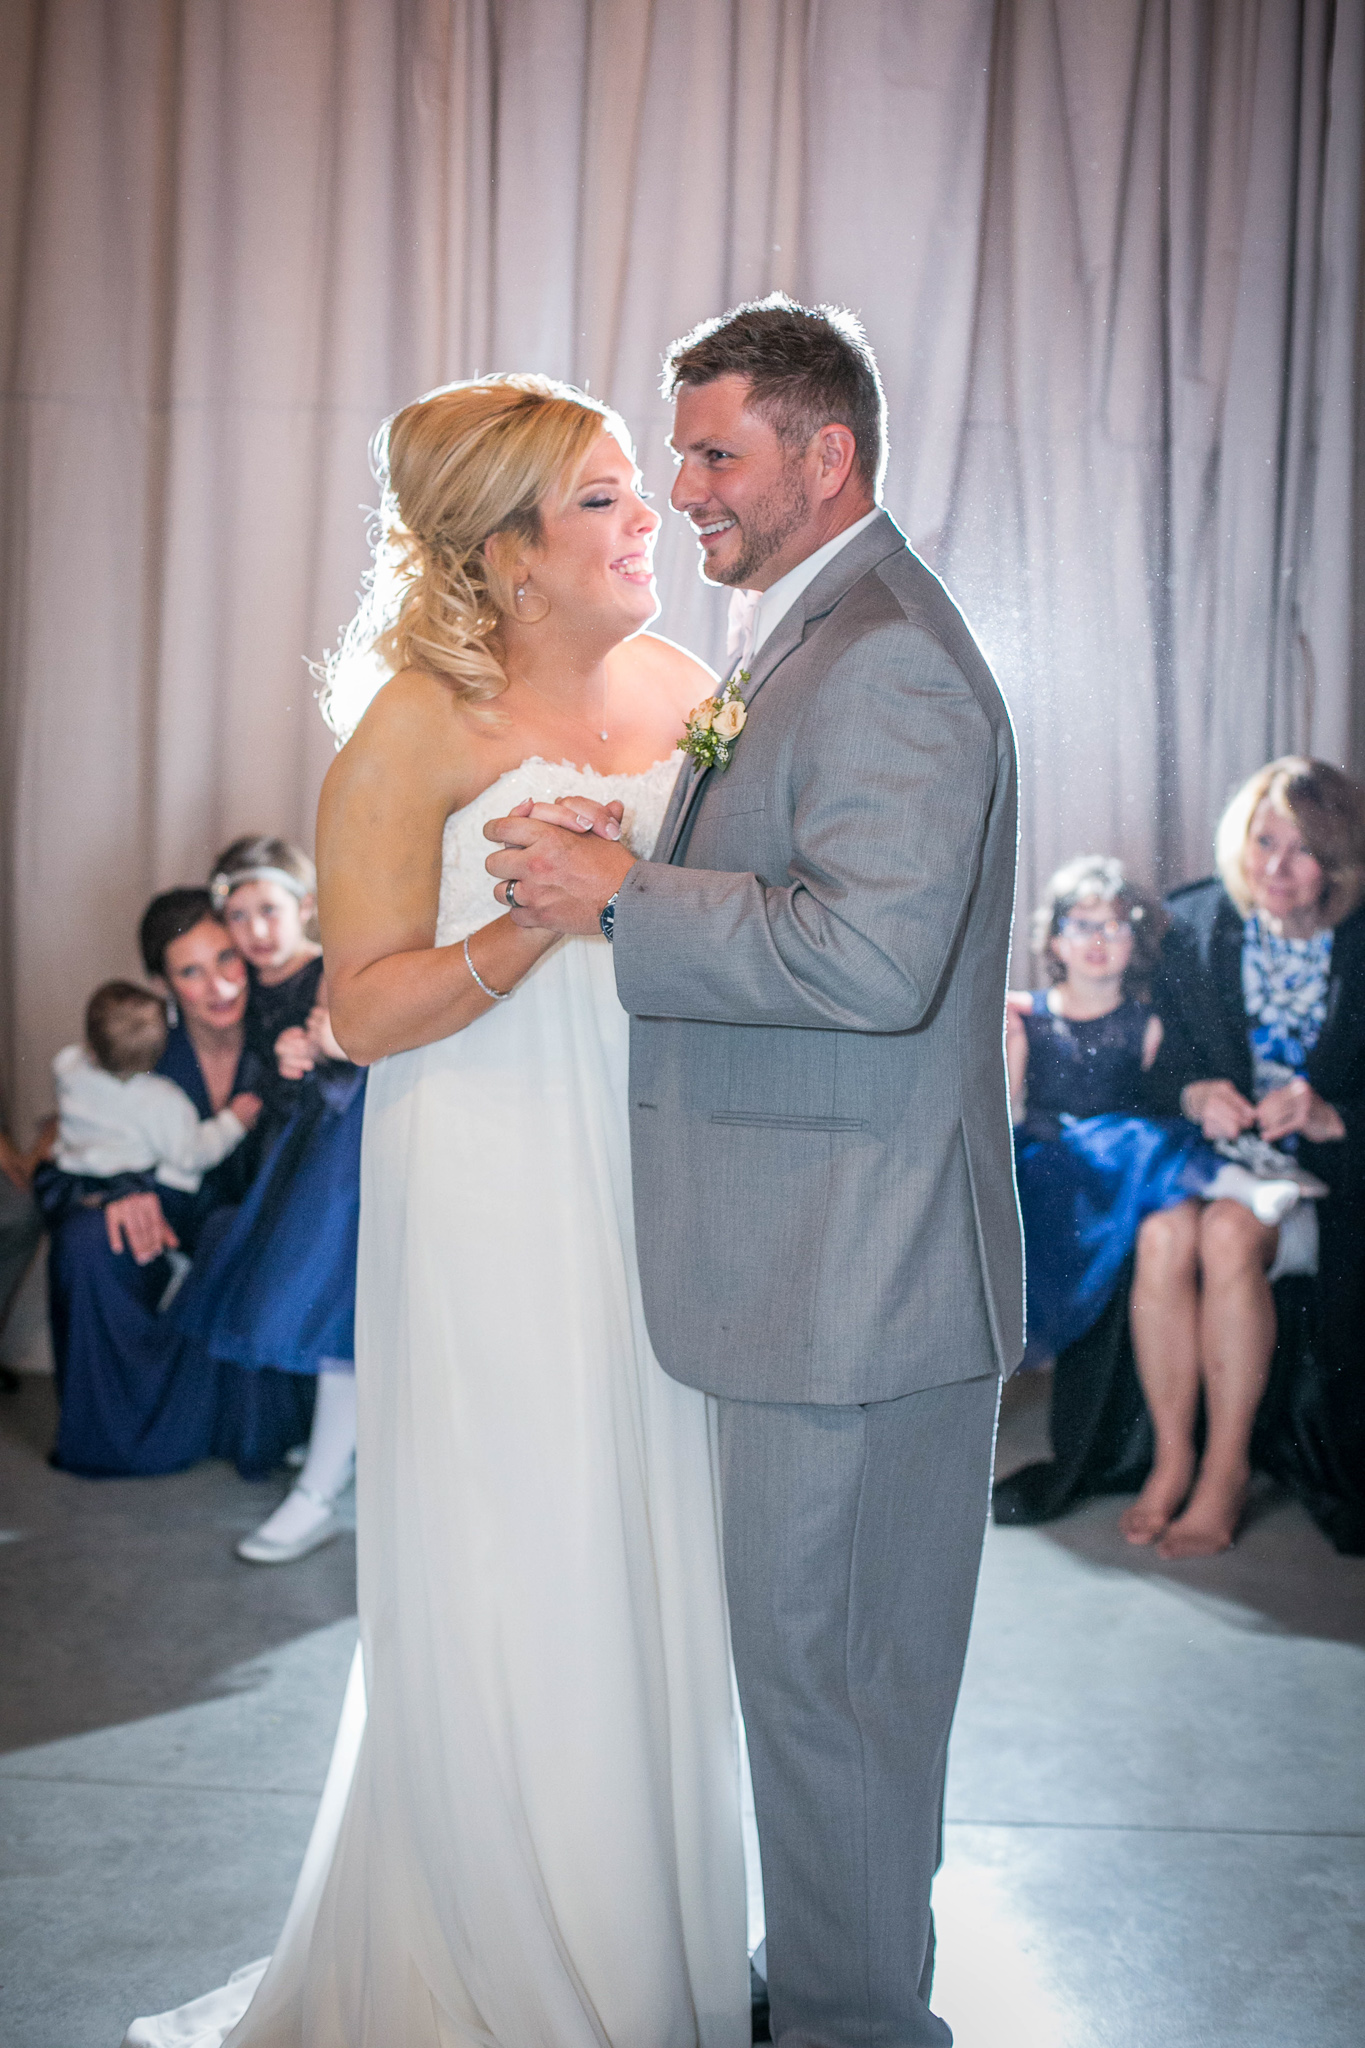 Wedding_Day_Moments_To_Do_List_Andrea&Jon-250.jpg